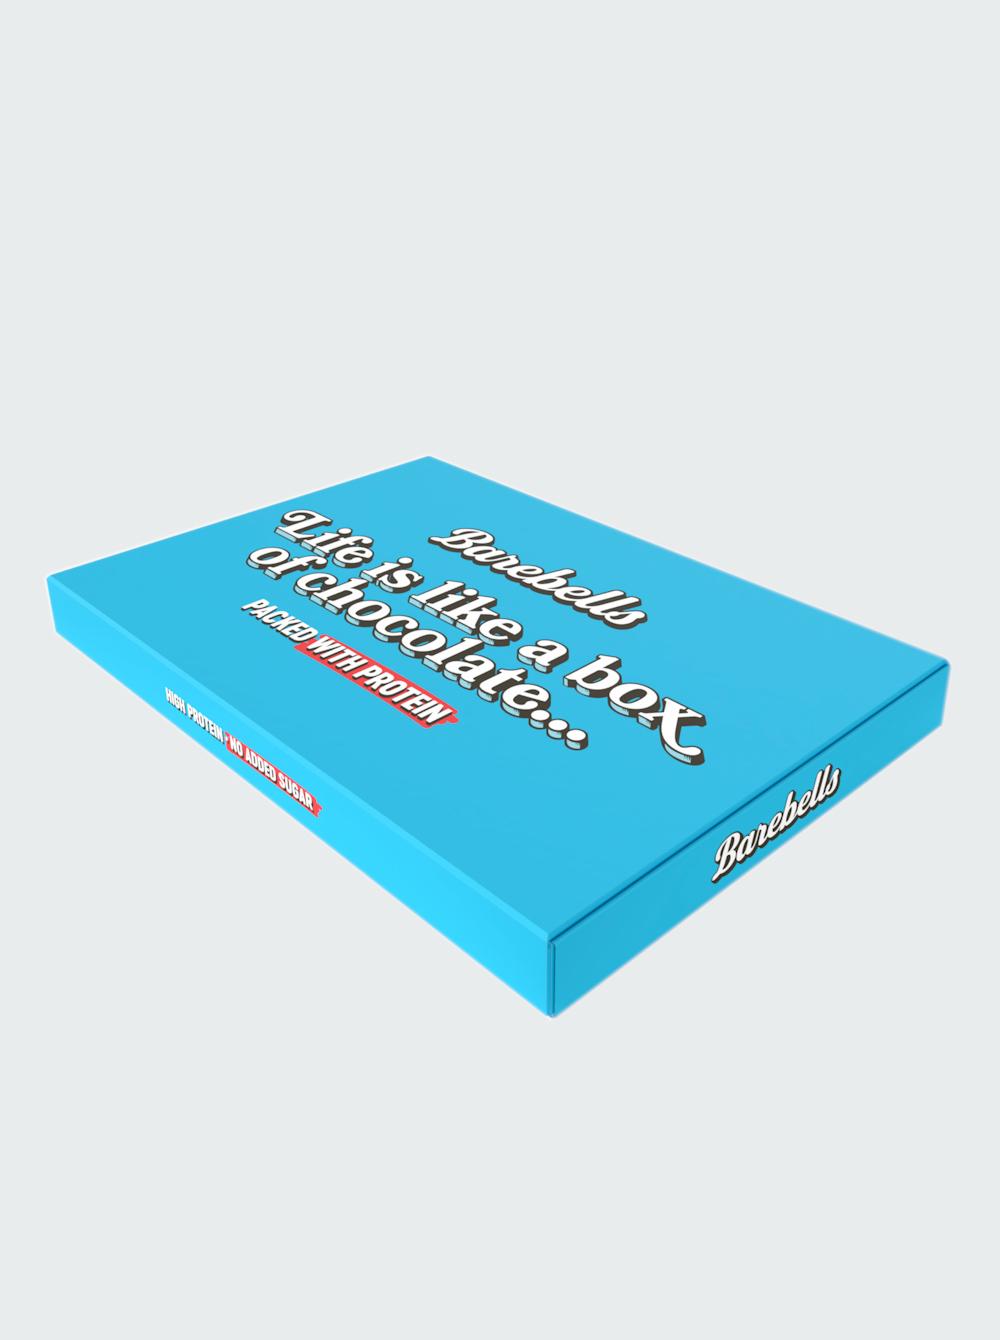 Barebells Box of Chocolate 12-pack